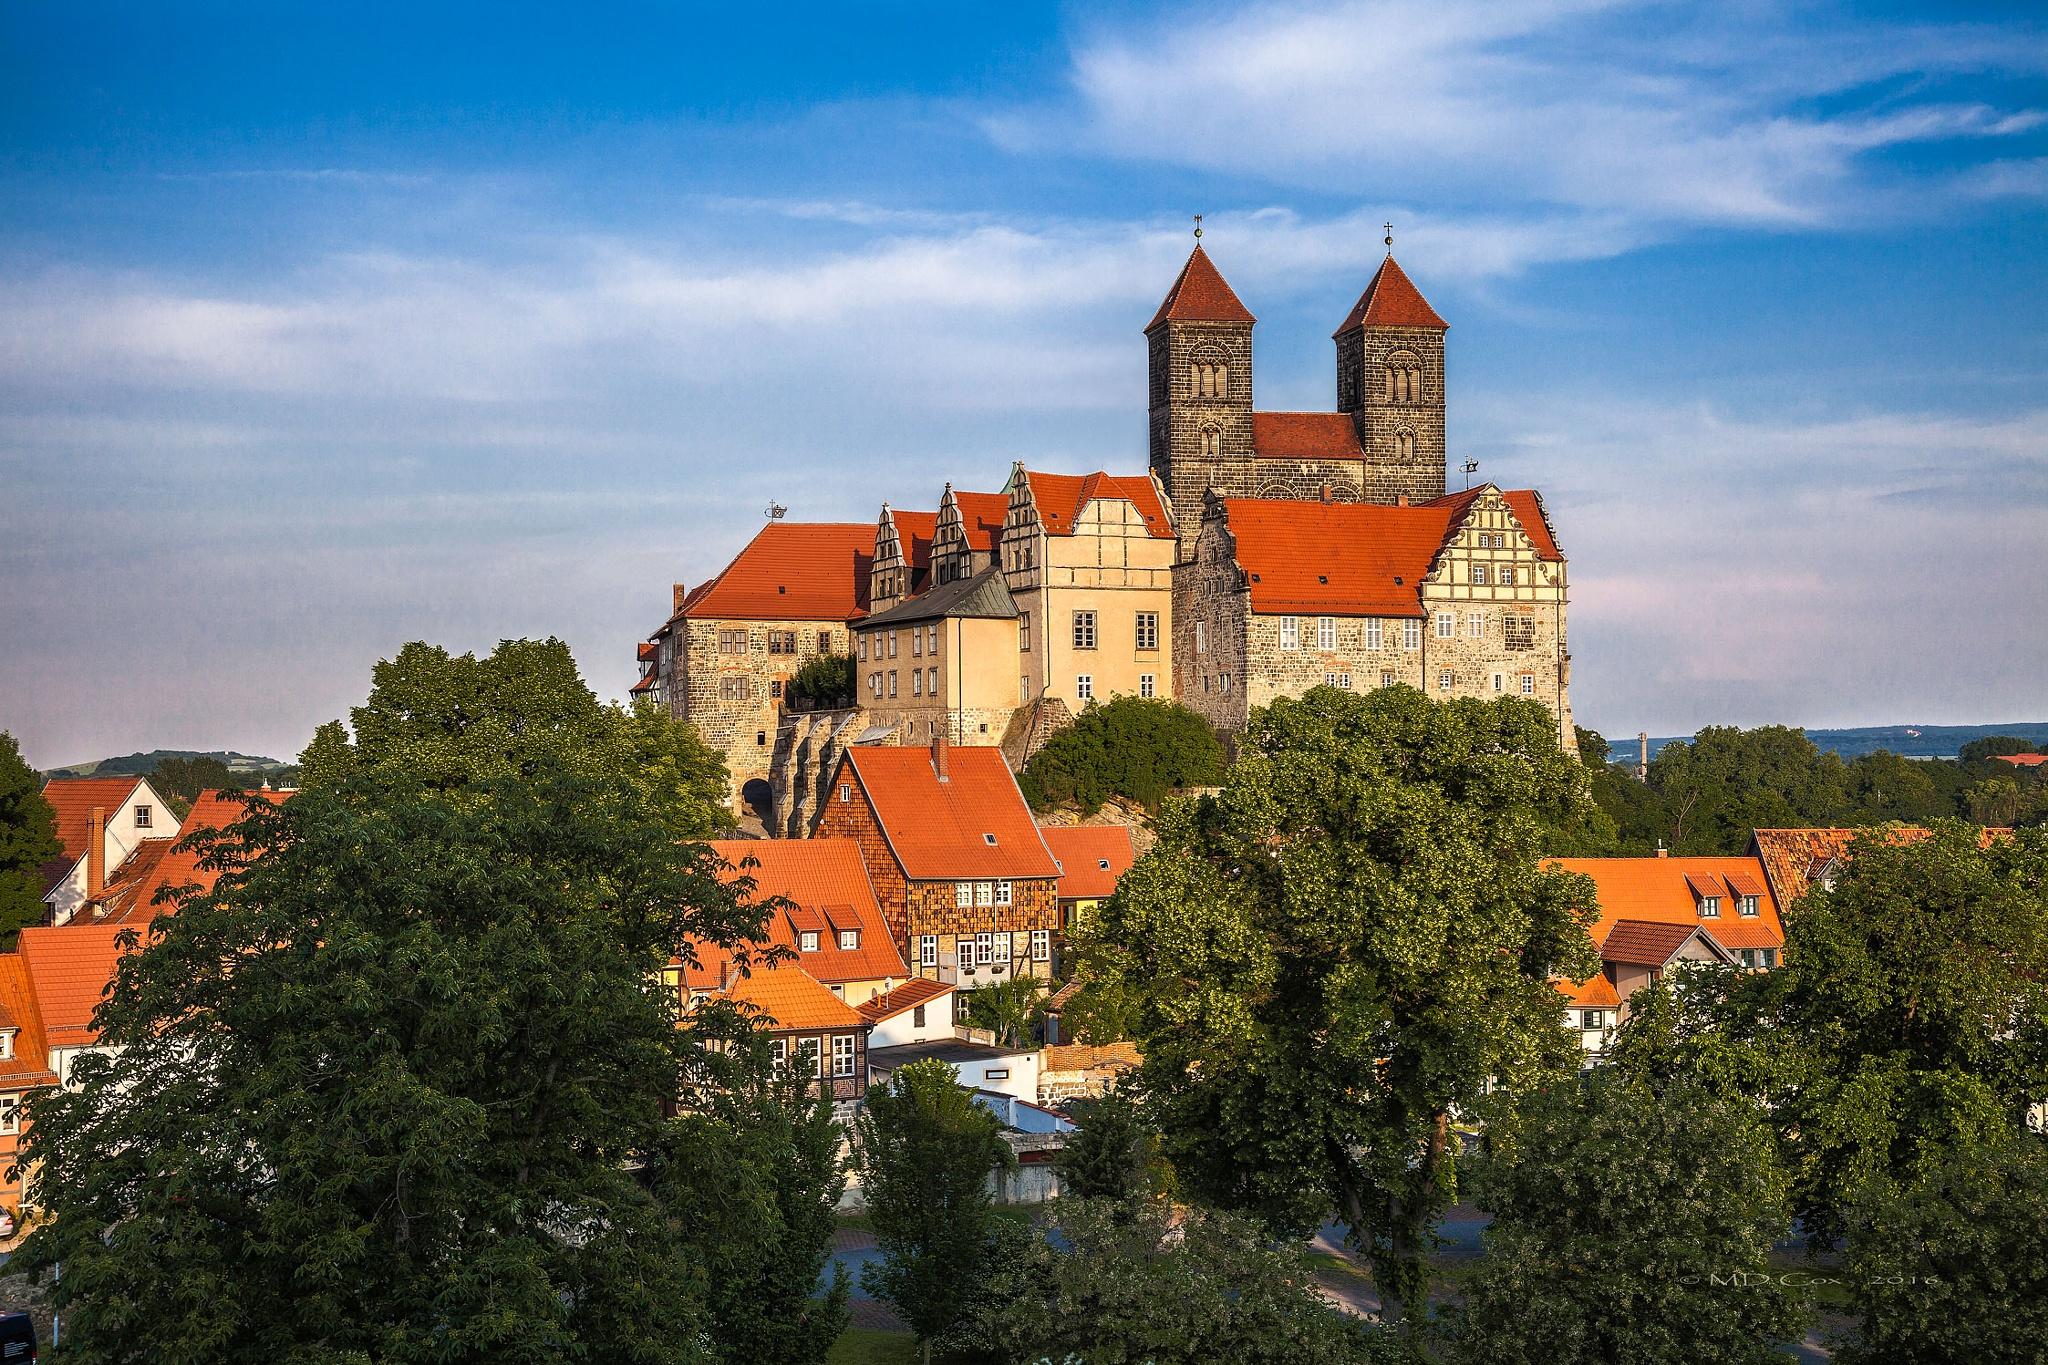 Quedlinburg by Michael Cox